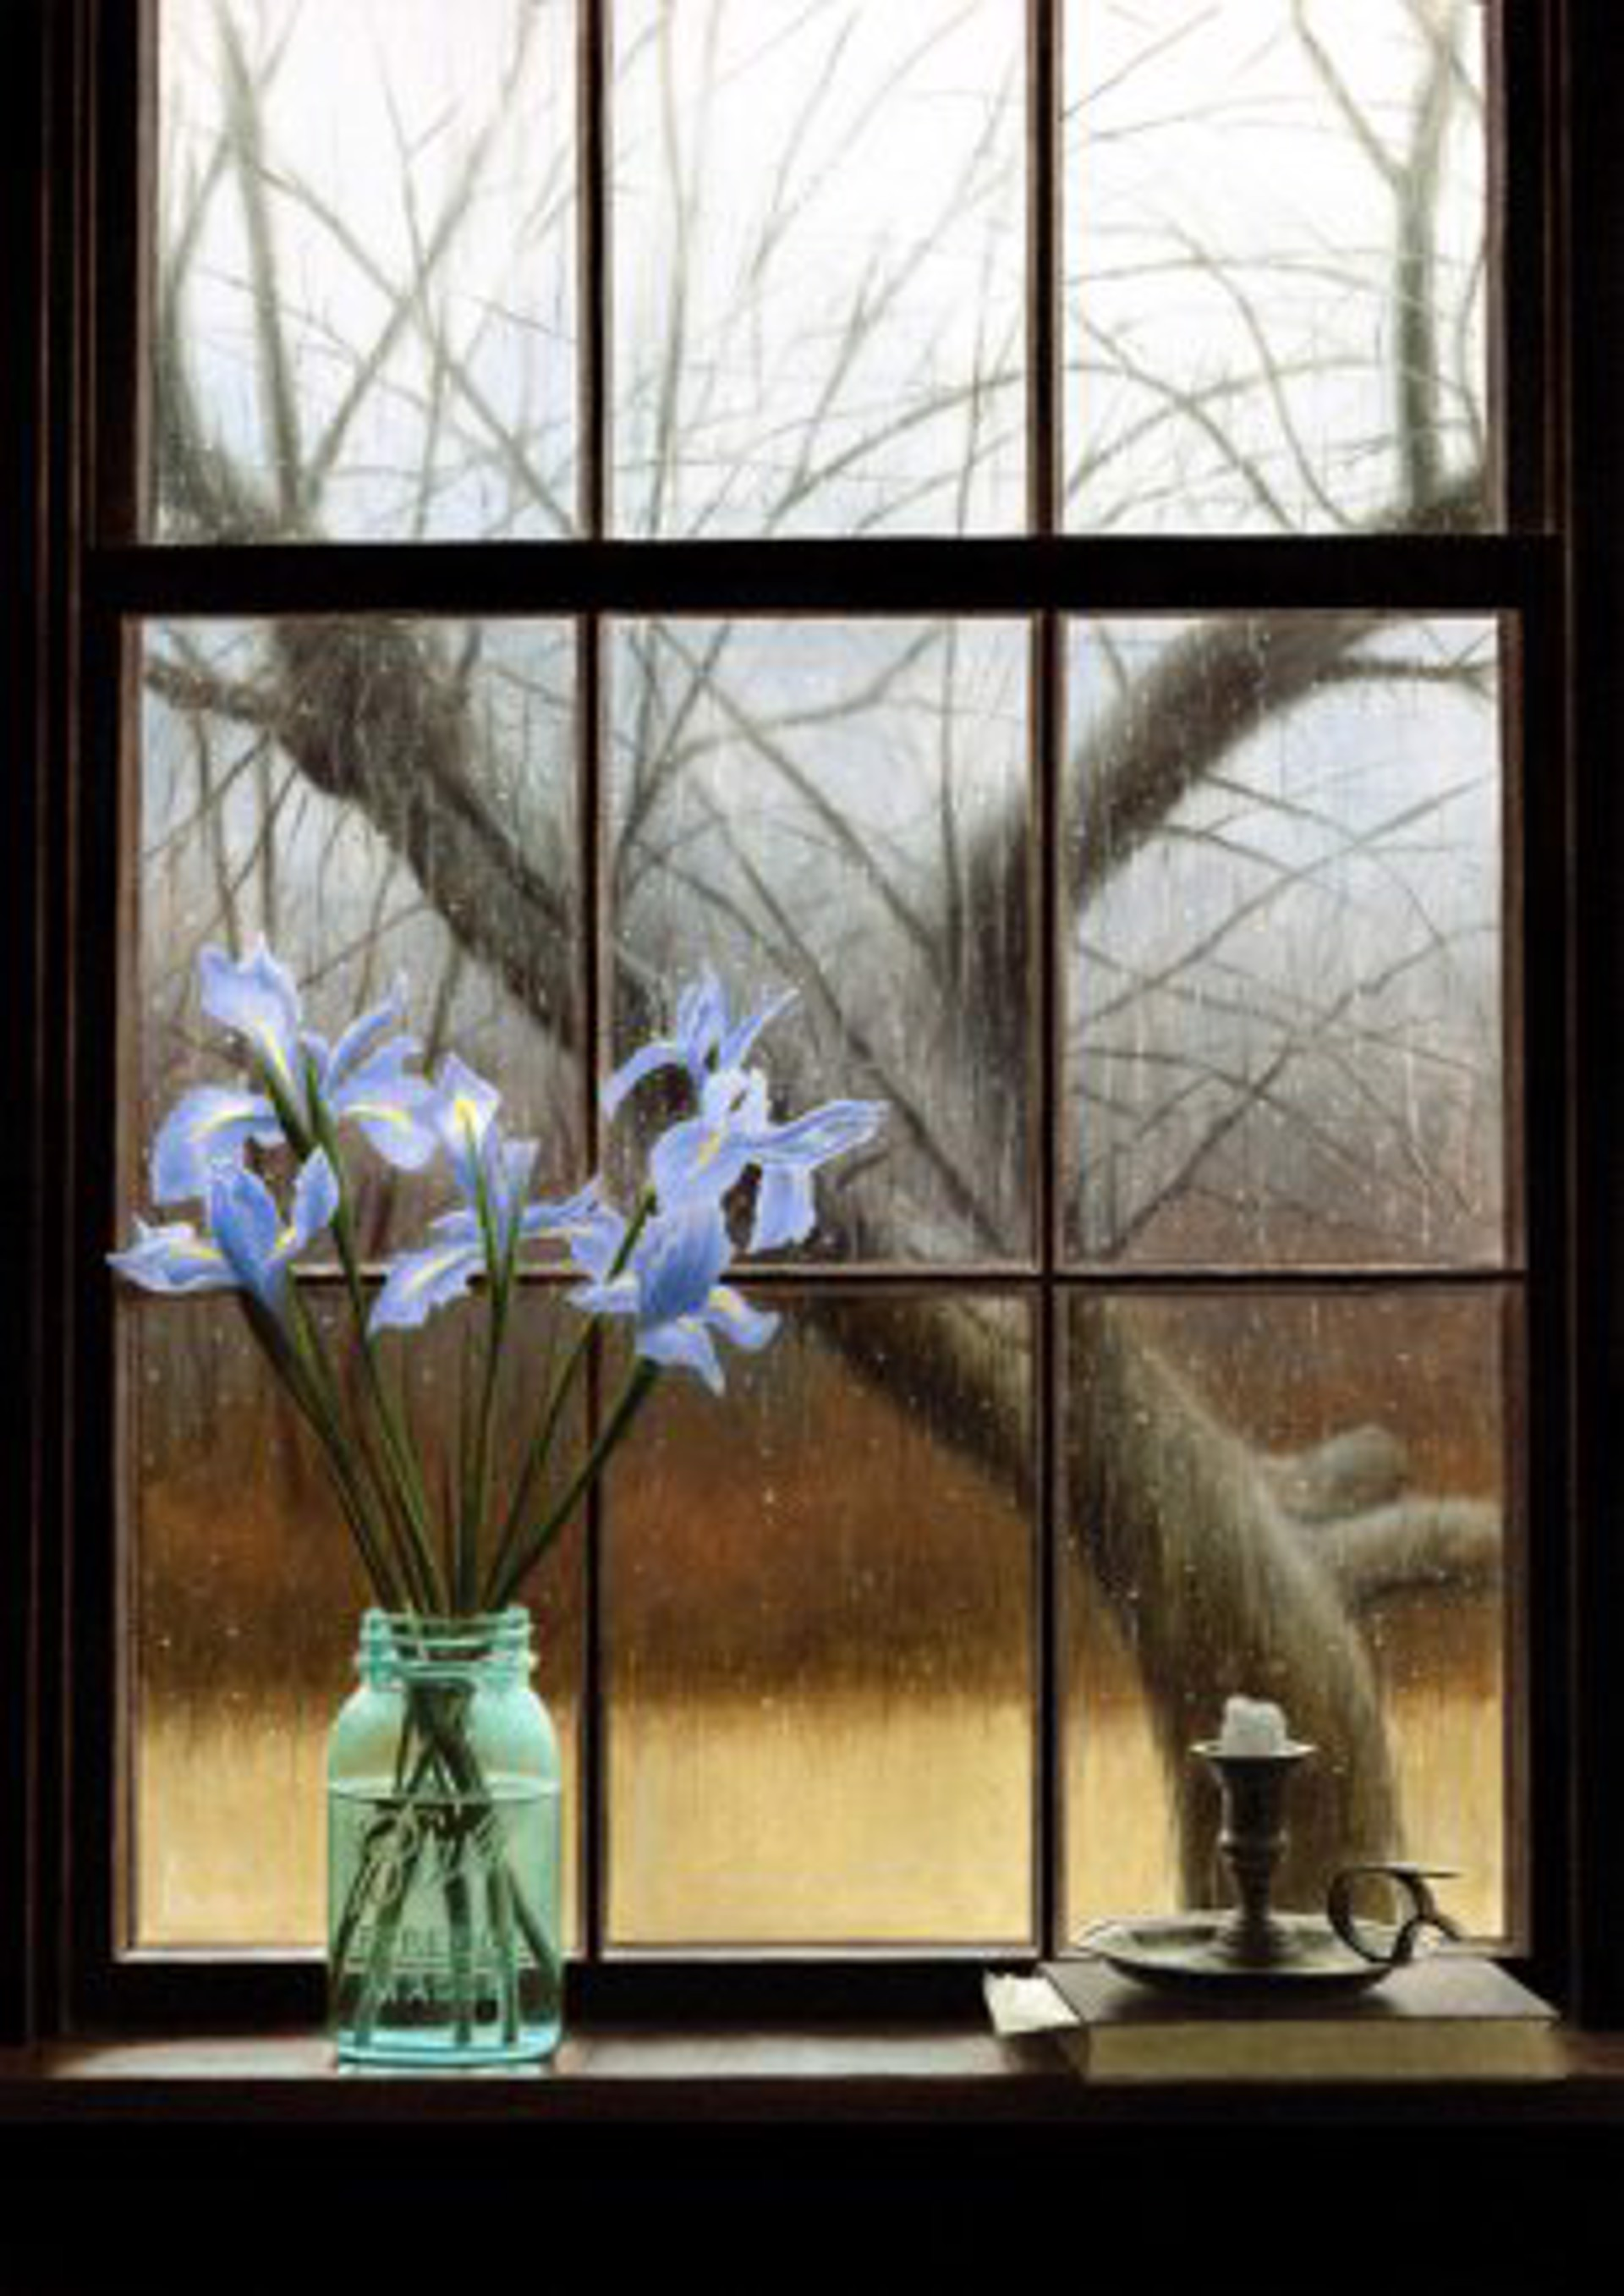 April Thunder by Alexander Volkov